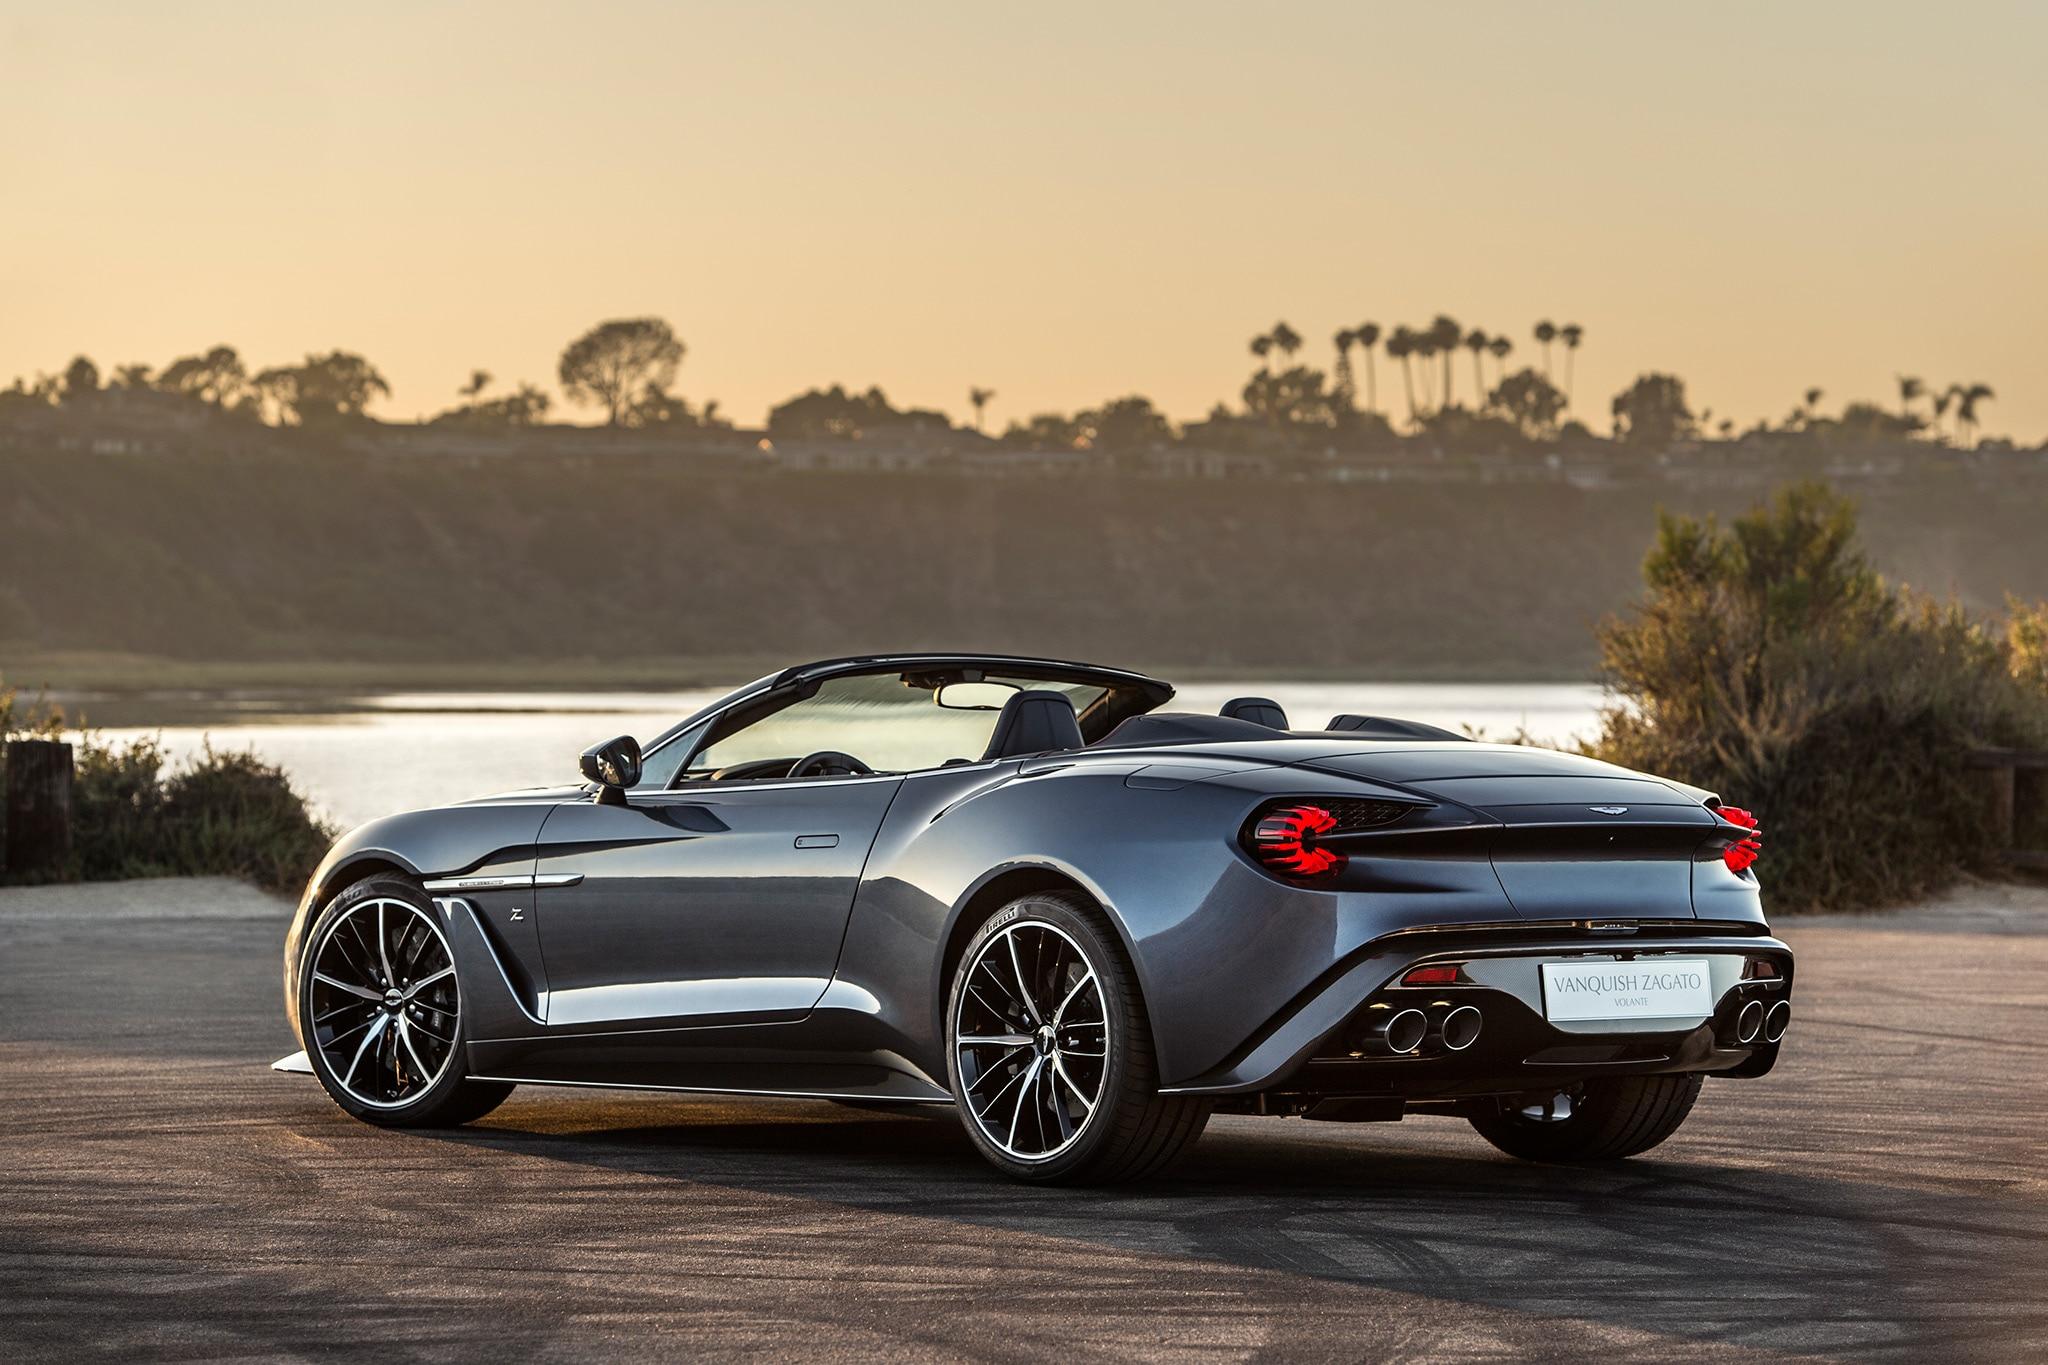 Aston Martin Debuts Vanquish Zagato Speedster, Teases